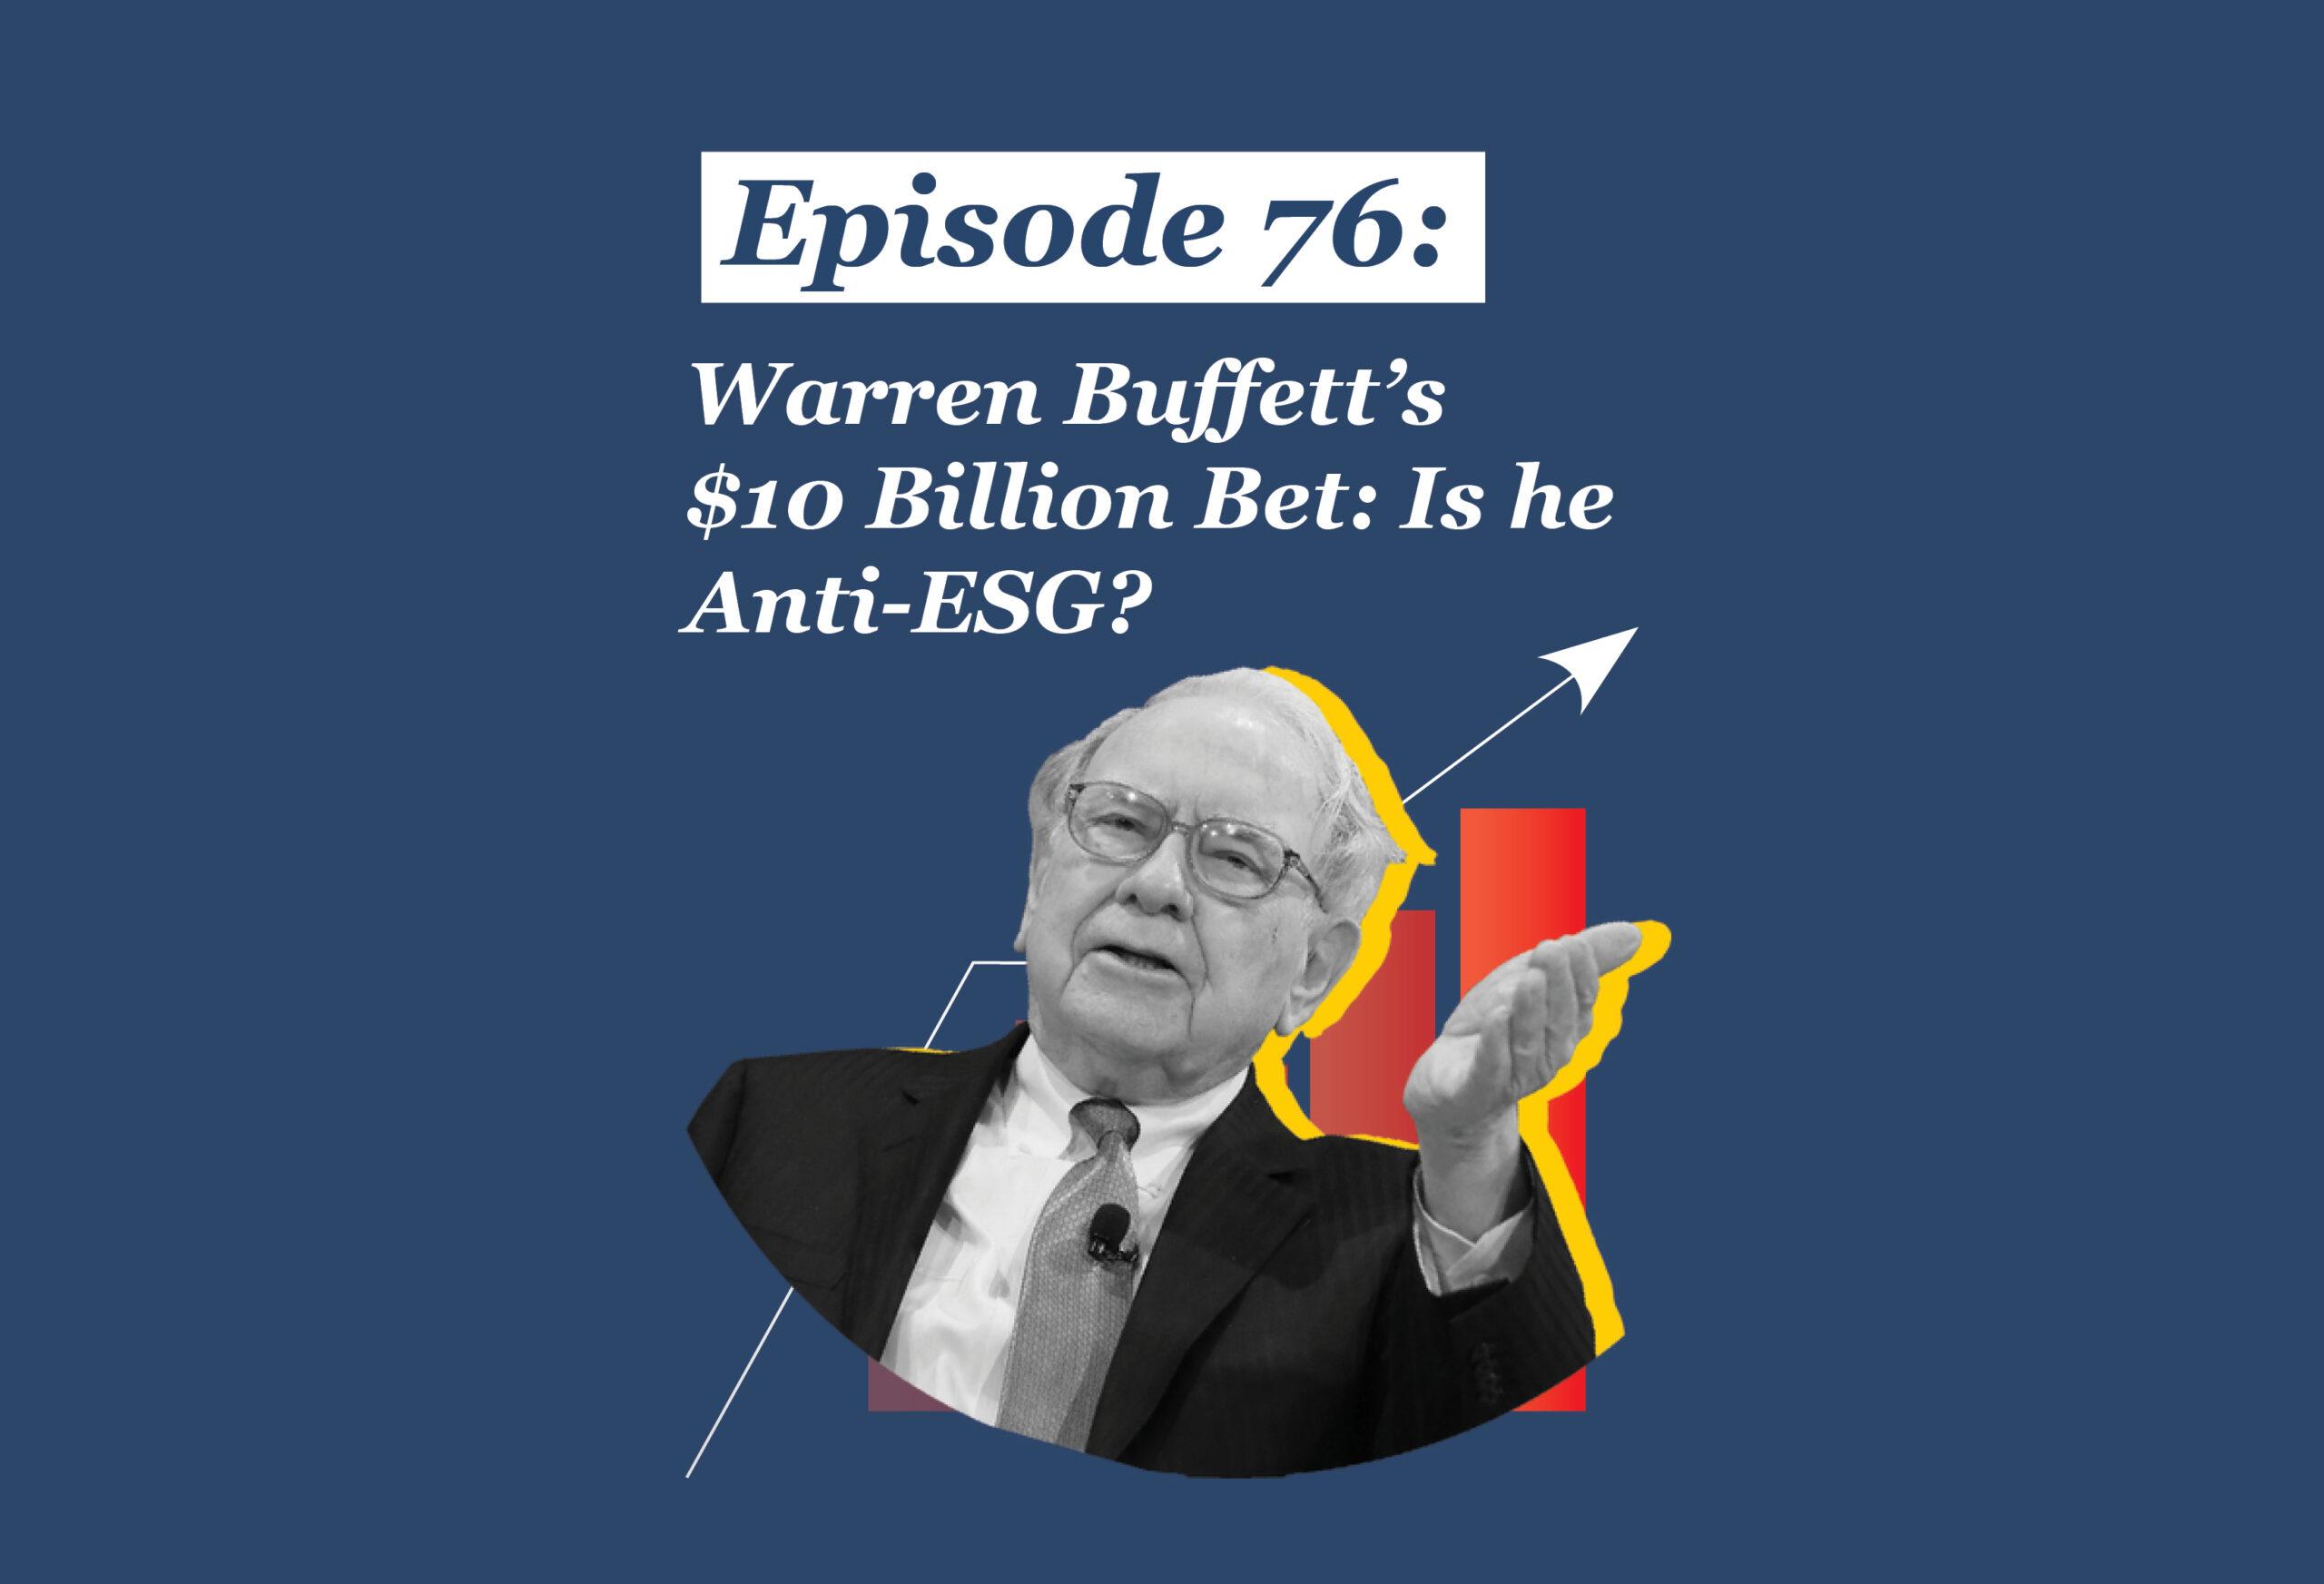 Absolute Return Podcast #76: Warren Buffett's $10 Billion Bet: Is he Anti-ESG?